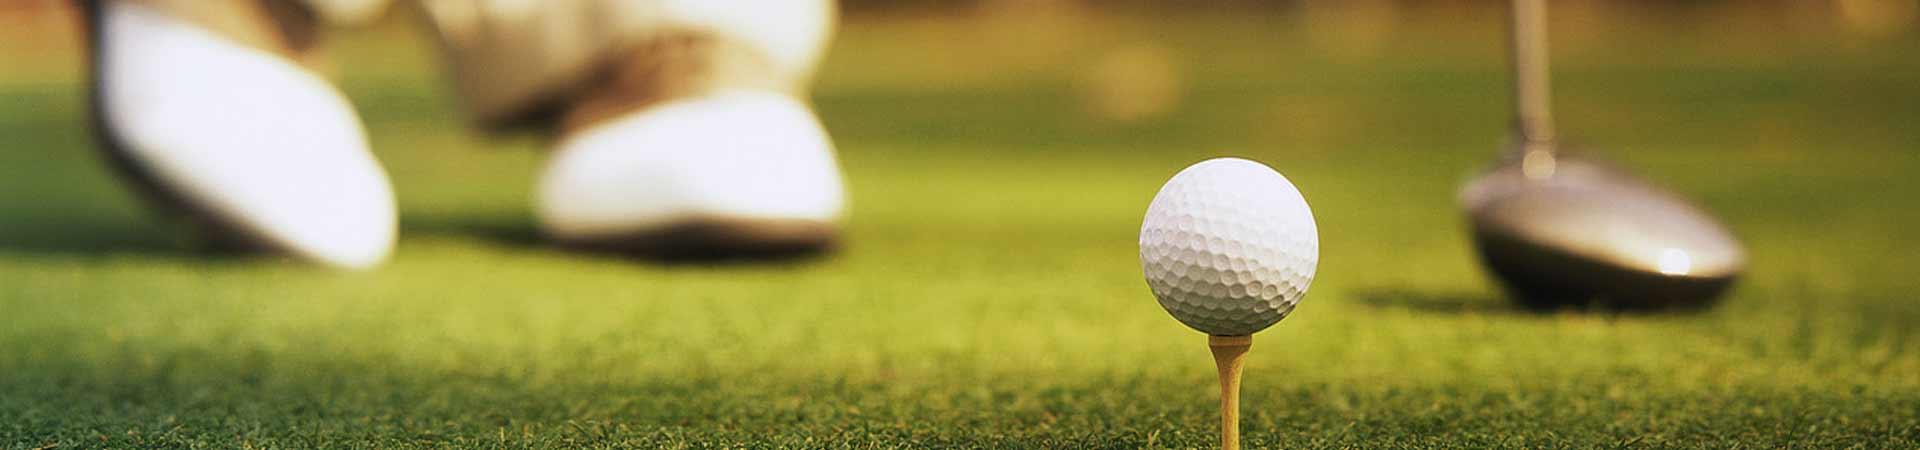 https://www.goodmorningtenerife.com/wp-content/uploads/2016/01/03_slide_tenerife-golf-shop-1920x450-1.jpg